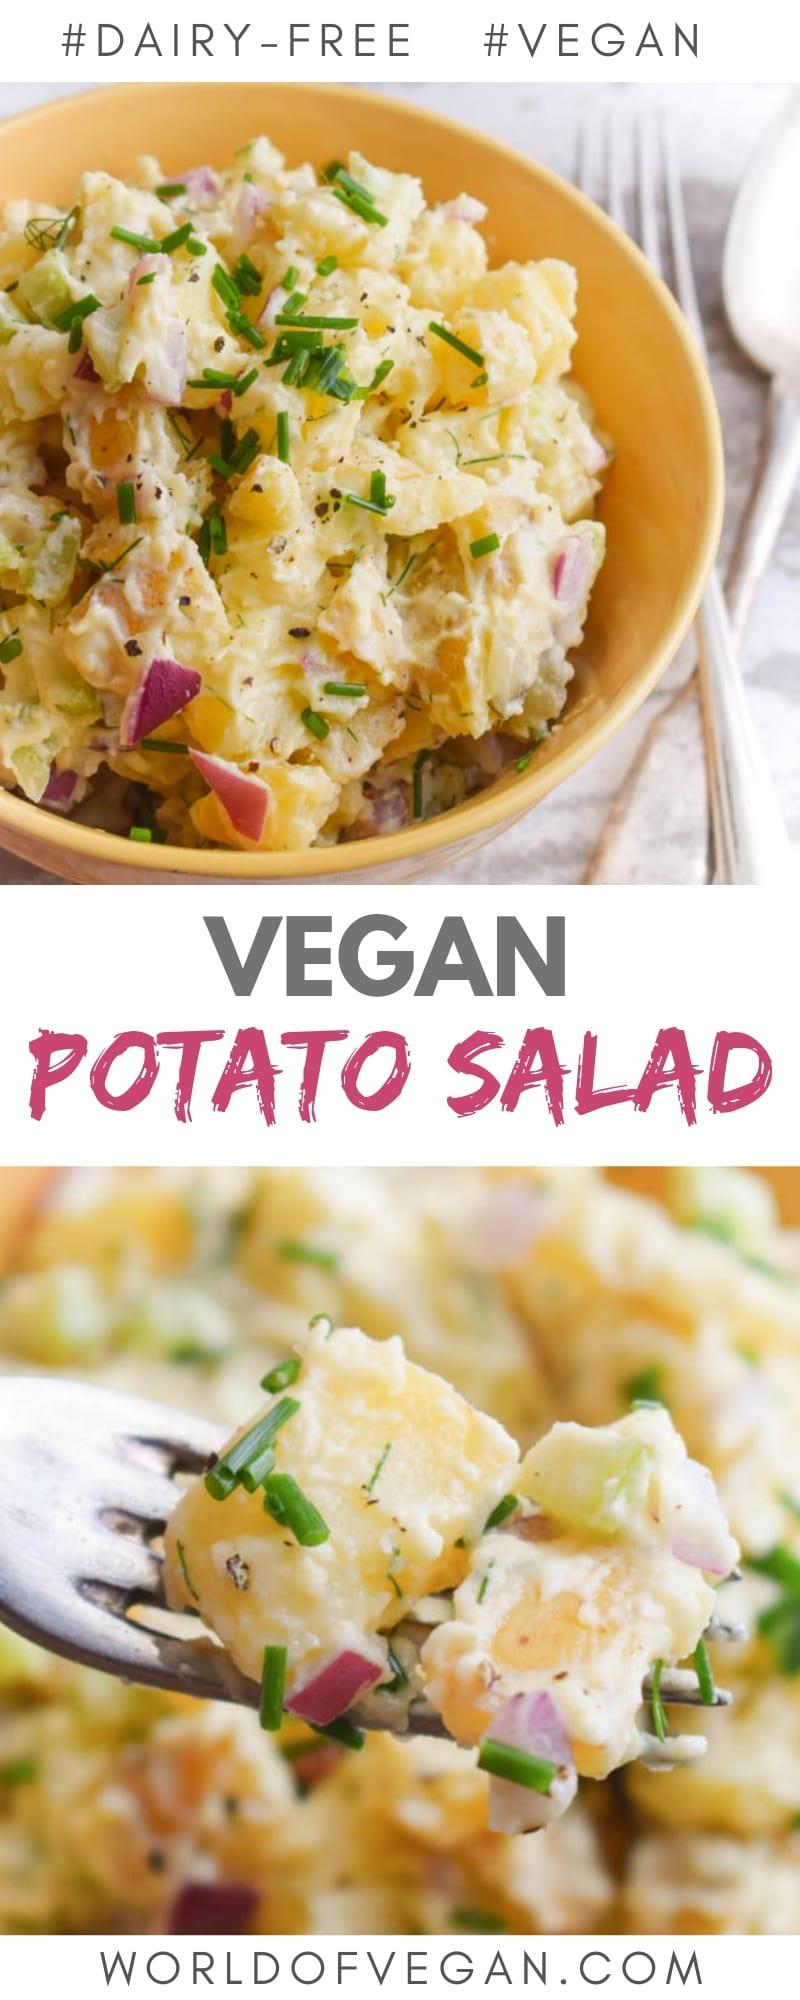 Vegan Potato Salad Recipe | World of Vegan | #vegan #potatoes #salad #picnic #barbecue #easy #glutenfree #worldofvegan